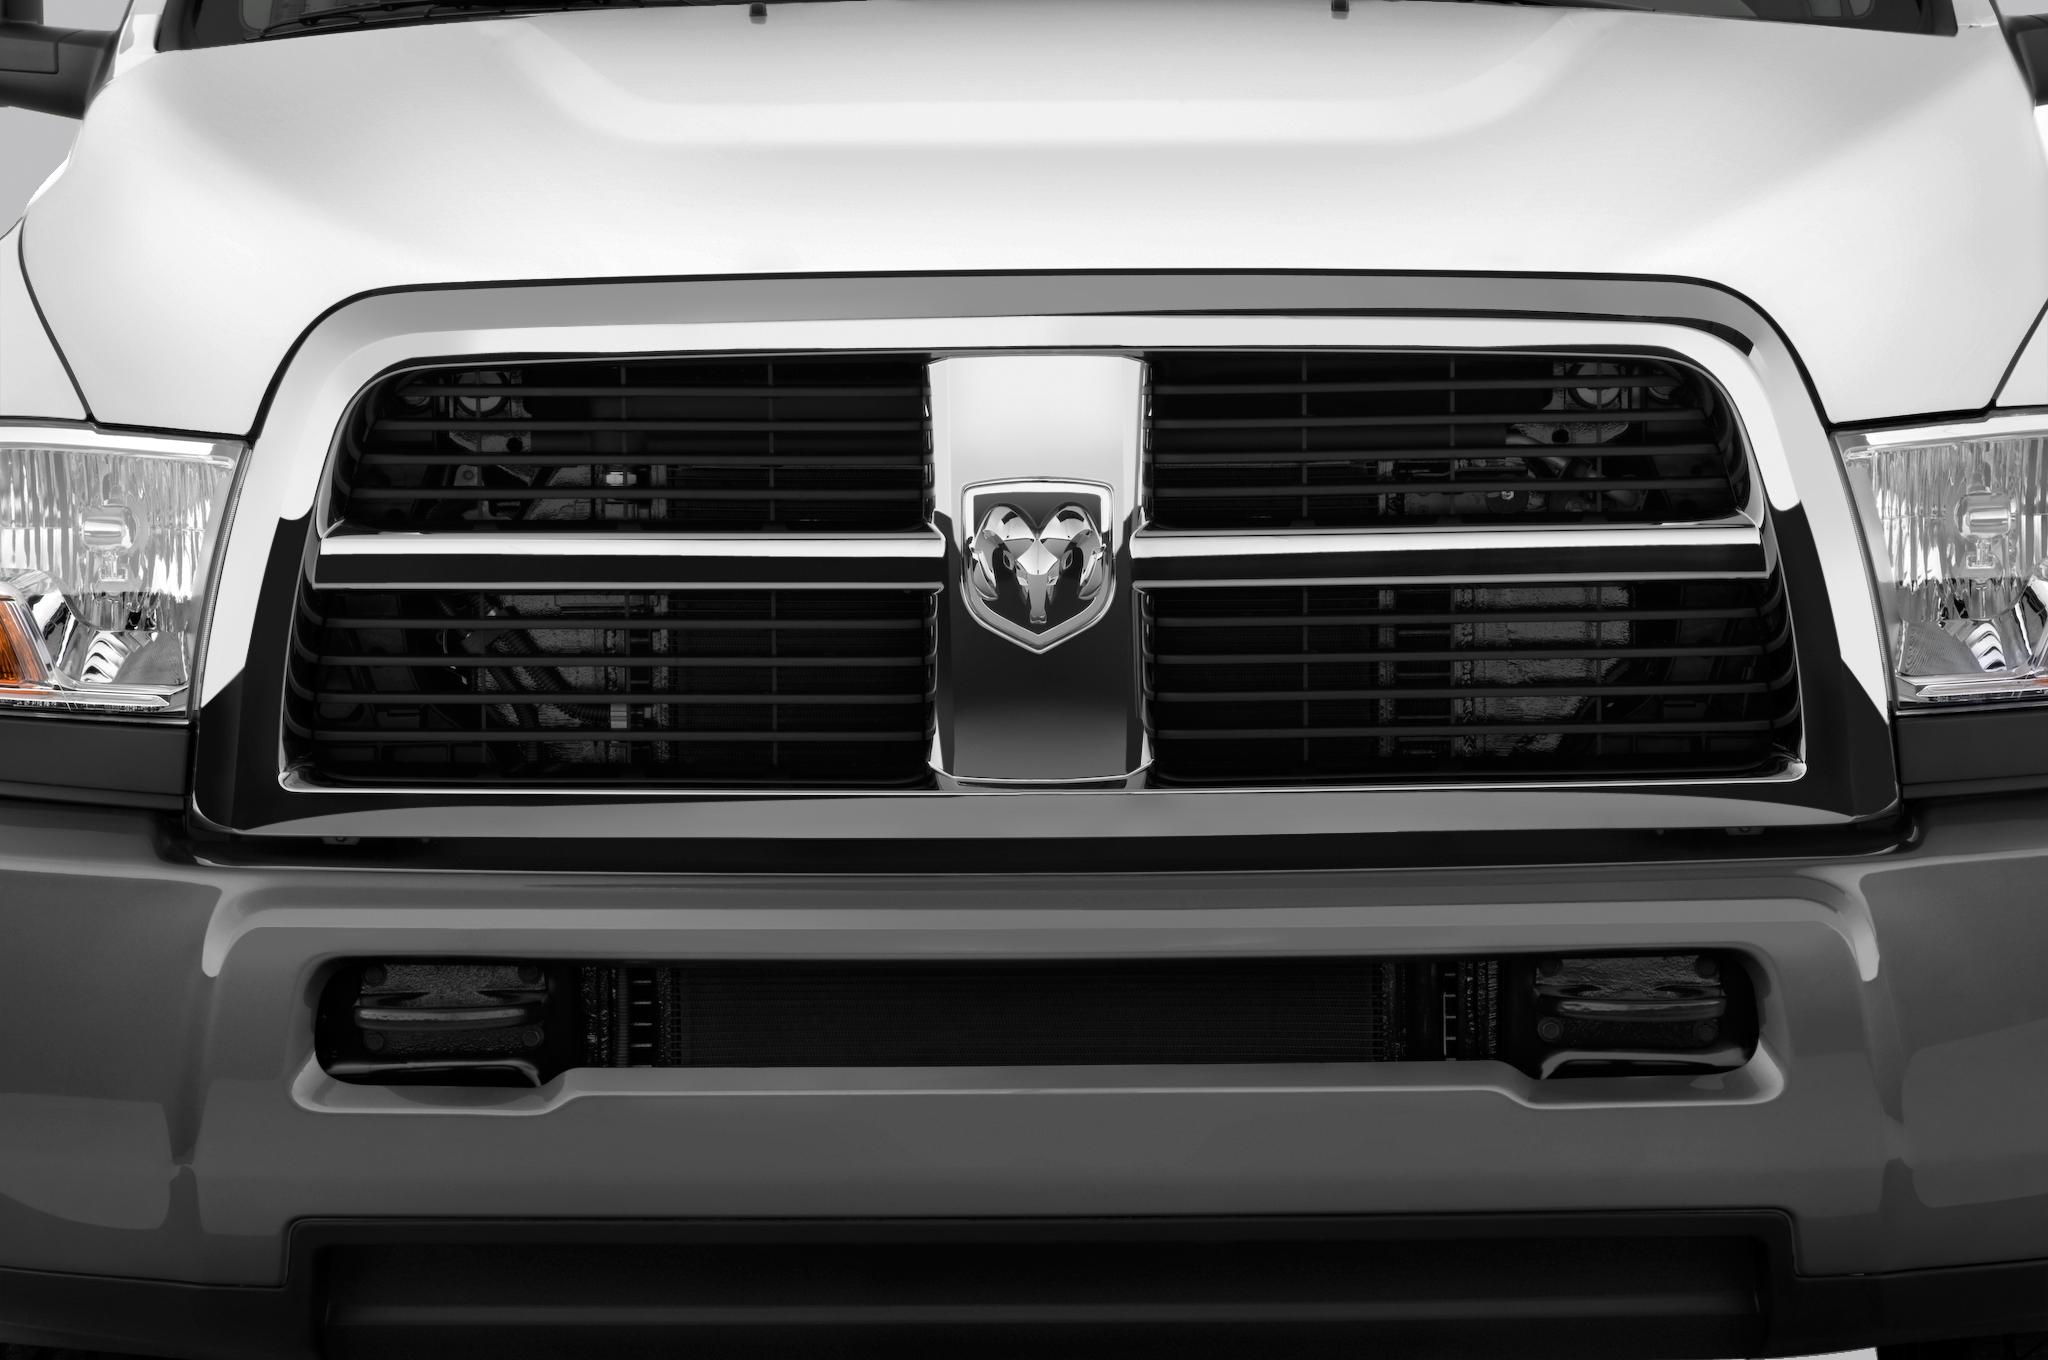 2010 dodge ram 2500 heavy duty dodge fullsize pickup truck review automobile magazine. Black Bedroom Furniture Sets. Home Design Ideas